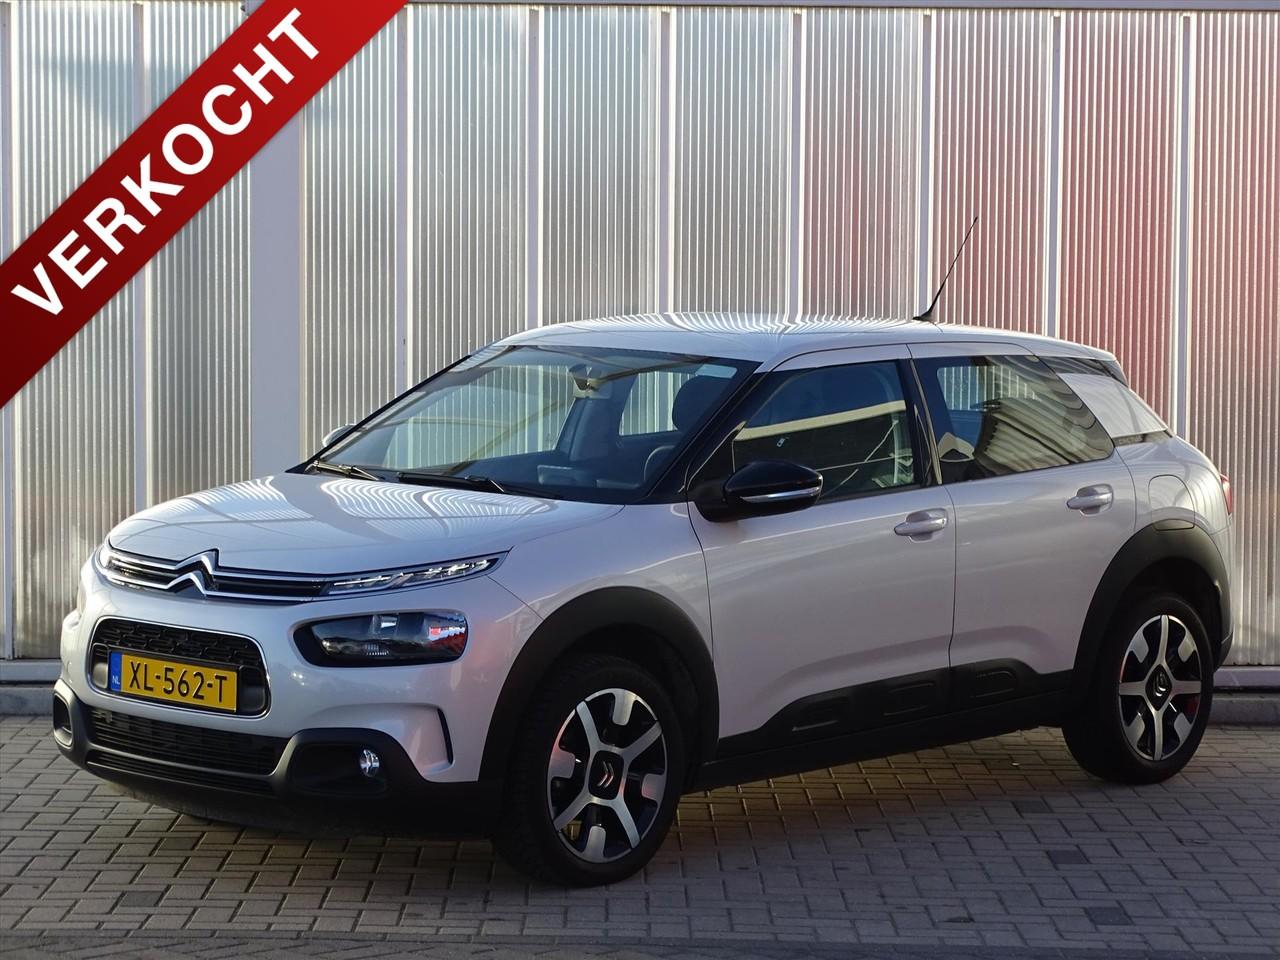 Citroën C4 cactus E-thp 110pk feel/navigatie/grip controle/pdc/camera